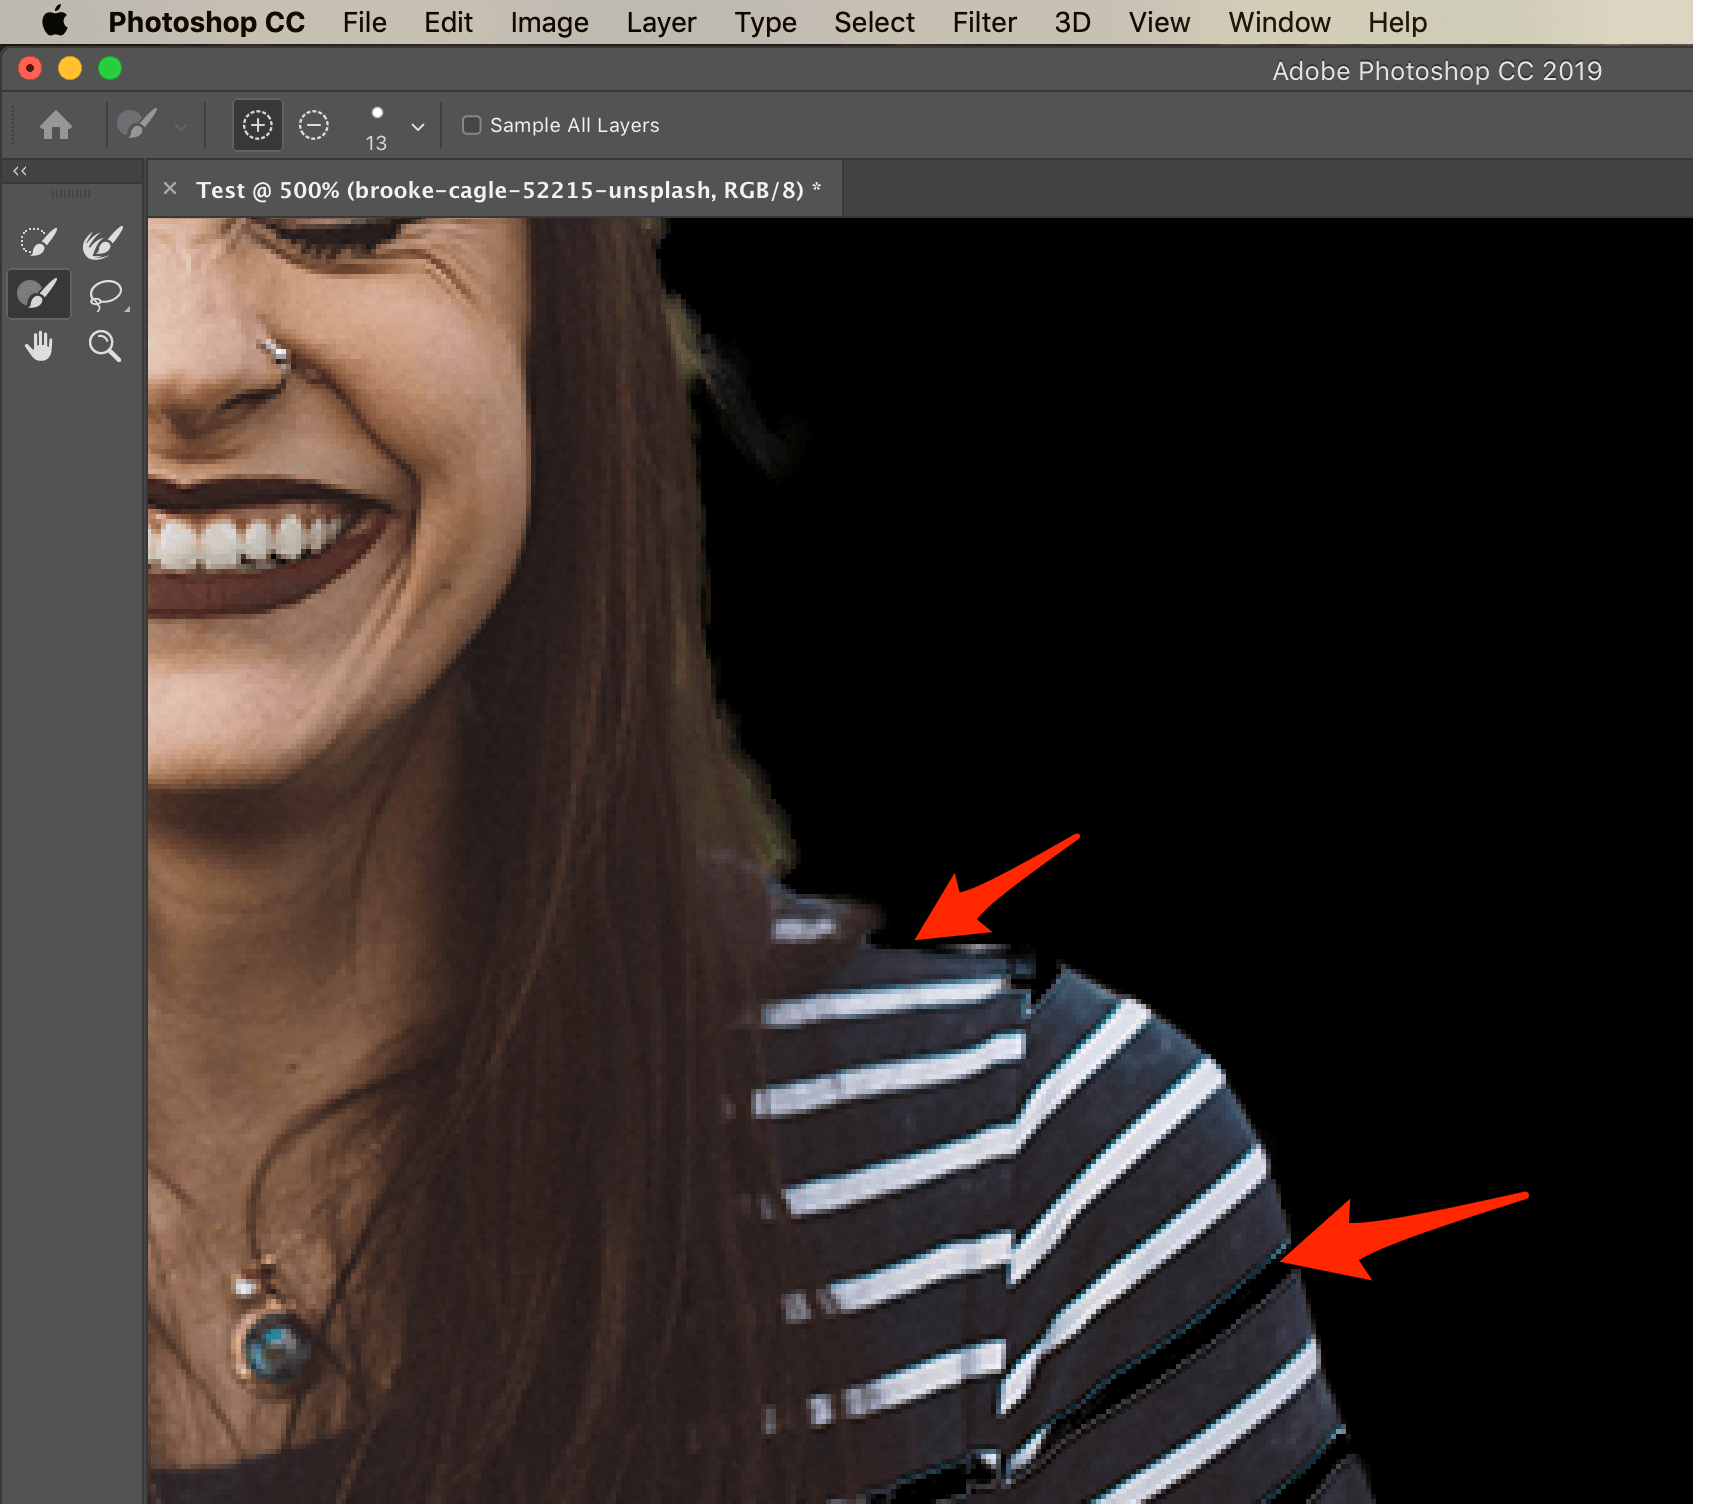 Select Image Photoshop